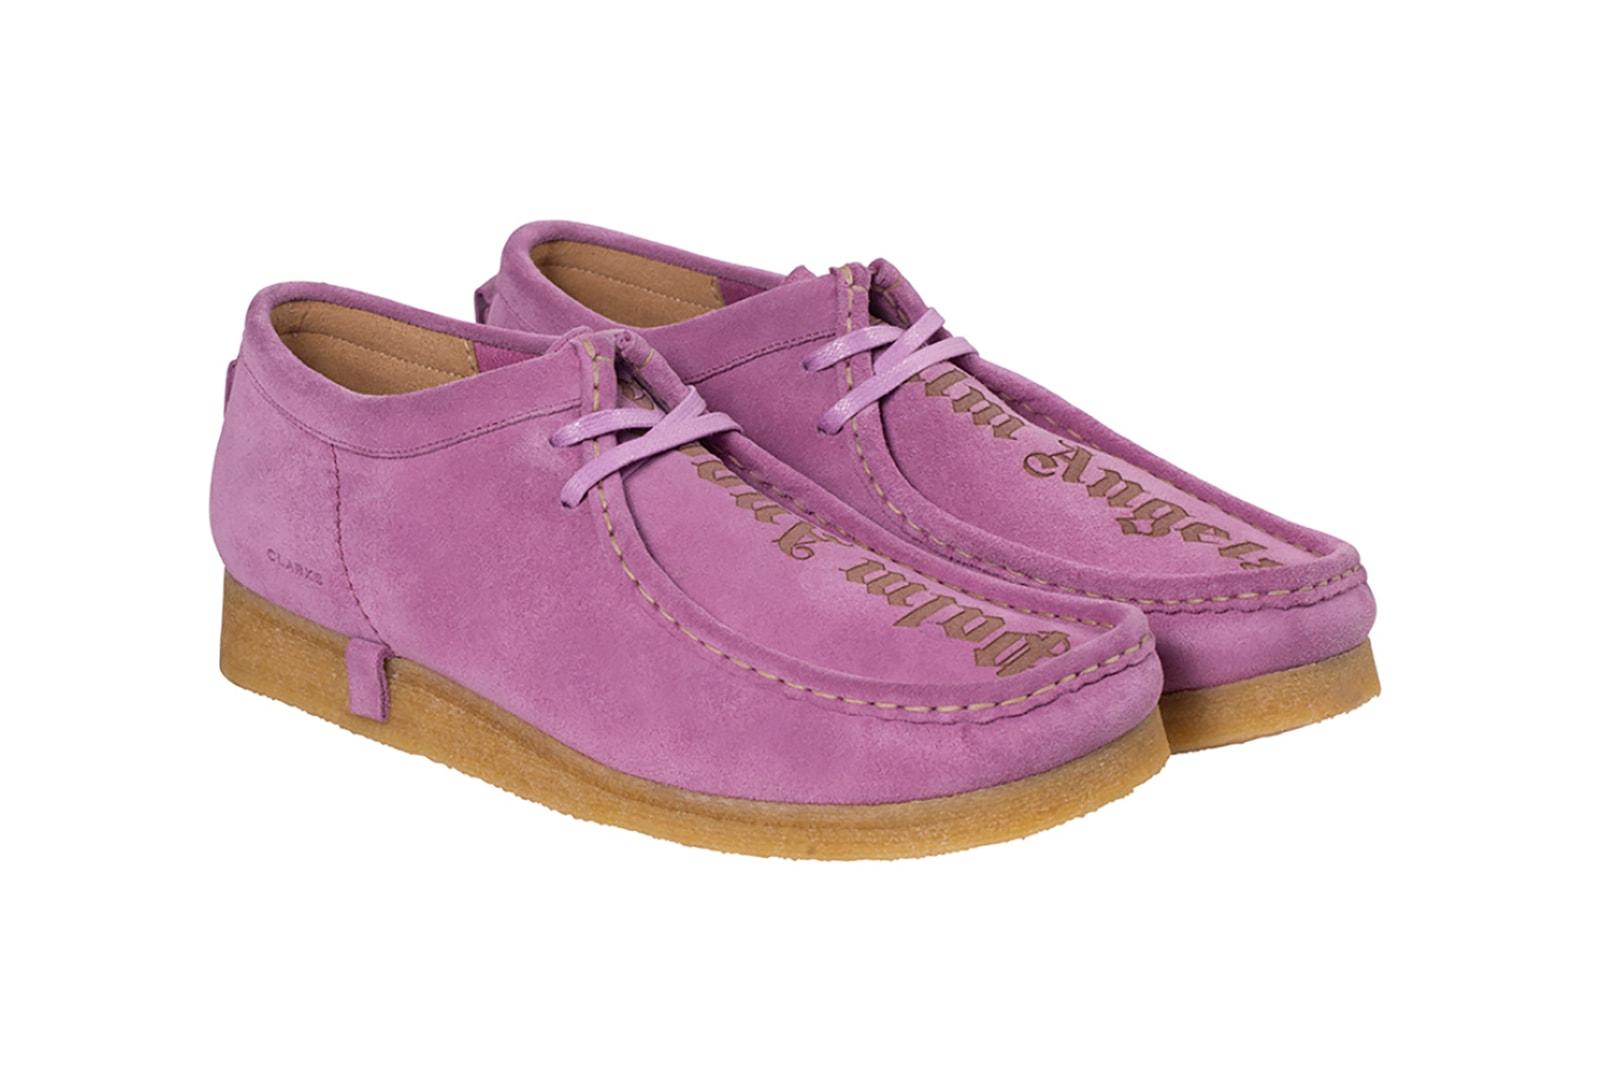 clarks originals palm angels collaboration wallabee boots black purple shoes footwear